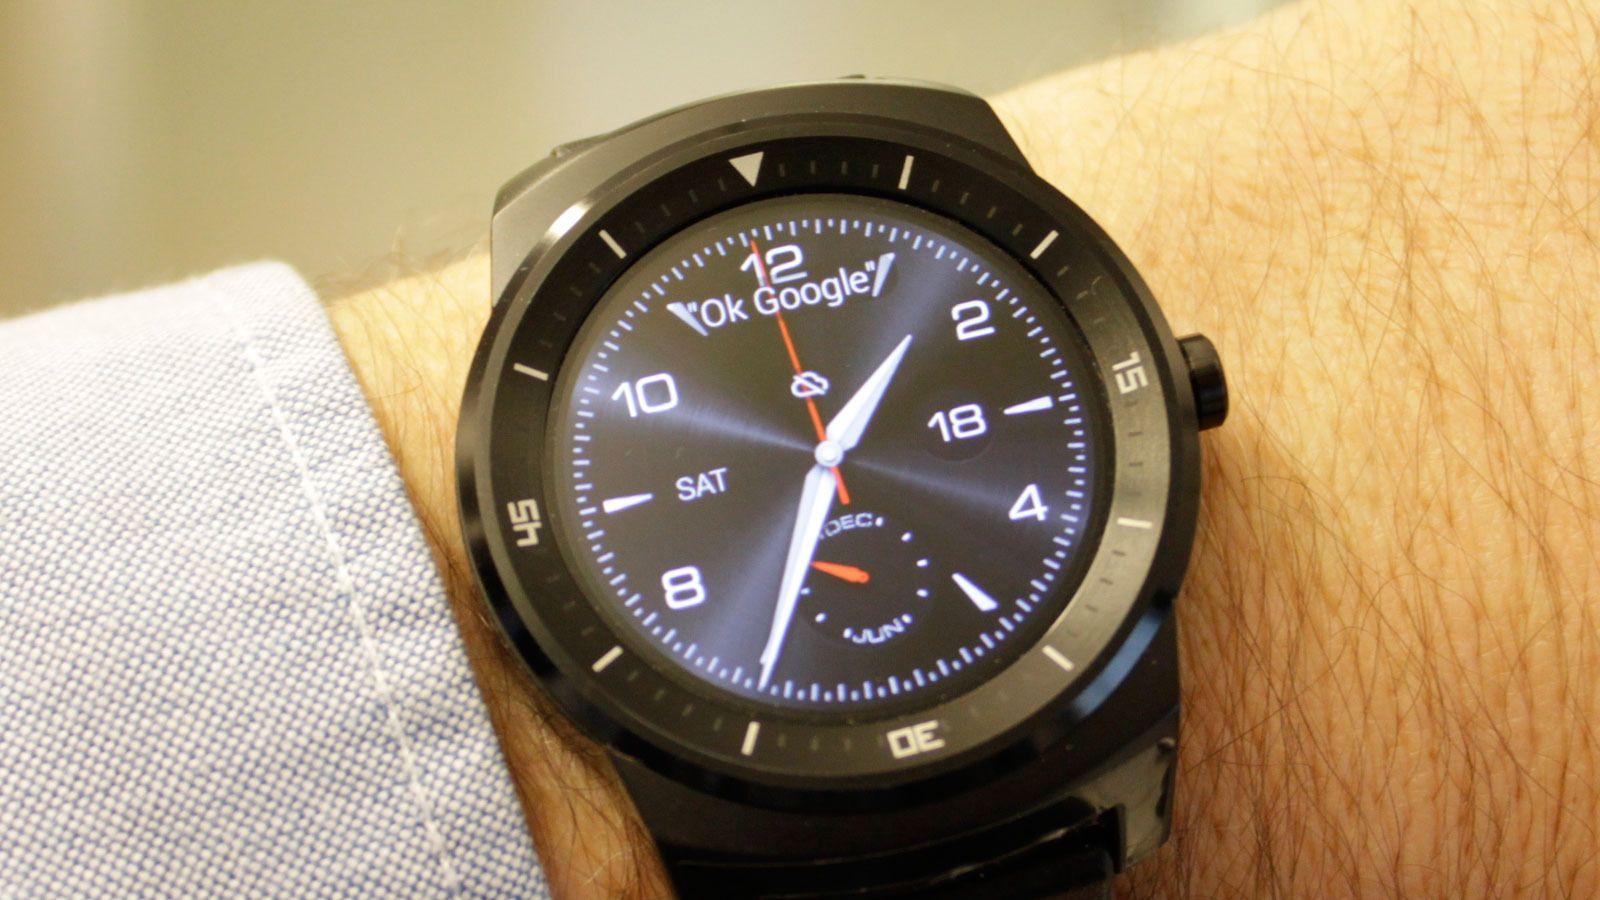 LG G Watch R kjører Android Wear-operativsystemet. . Foto: Espen Irwing Swang, Tek.no